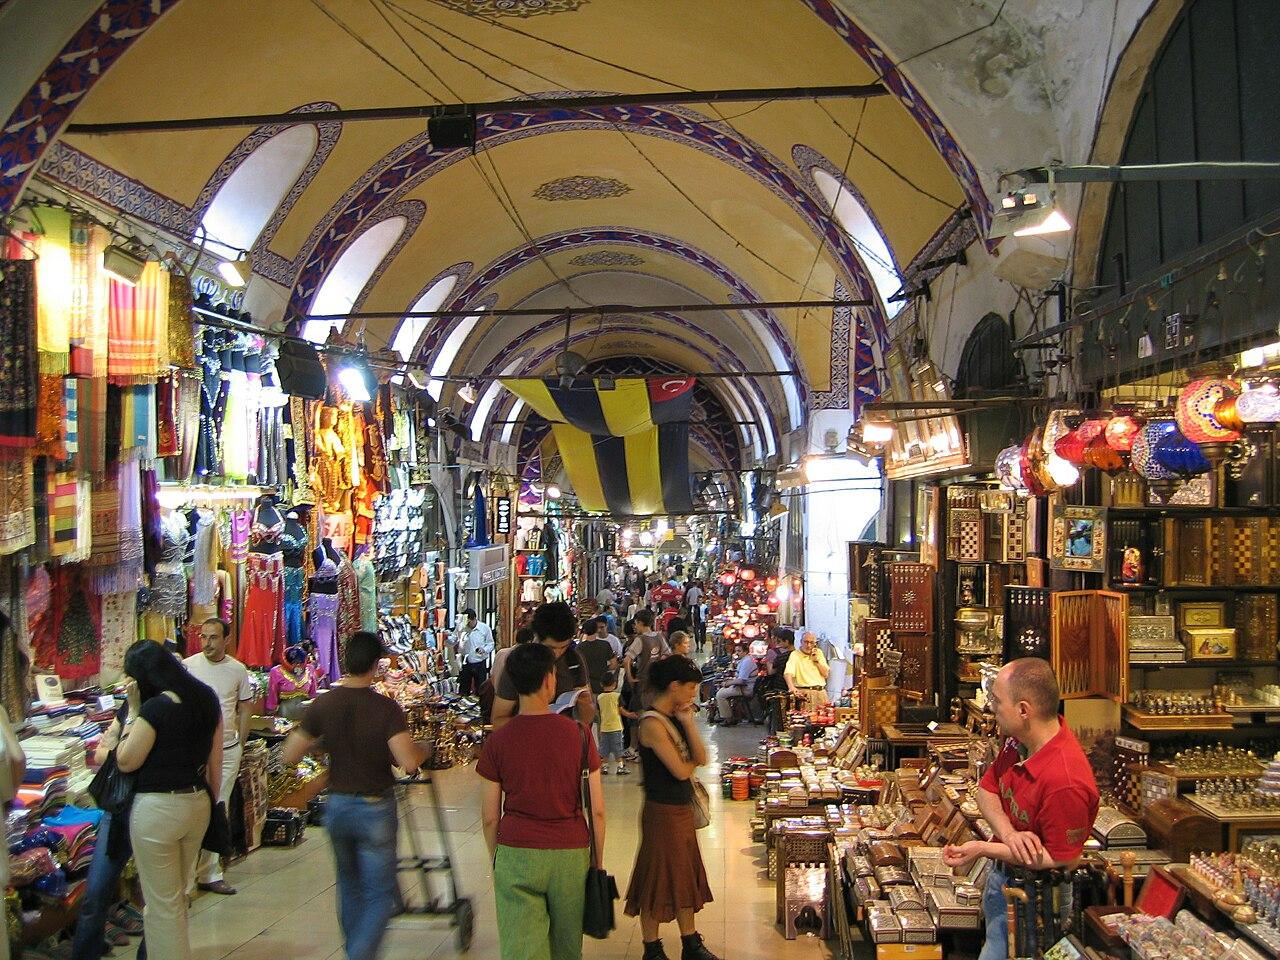 File:Istanbul grand bazar 1.jpg - Wikipedia